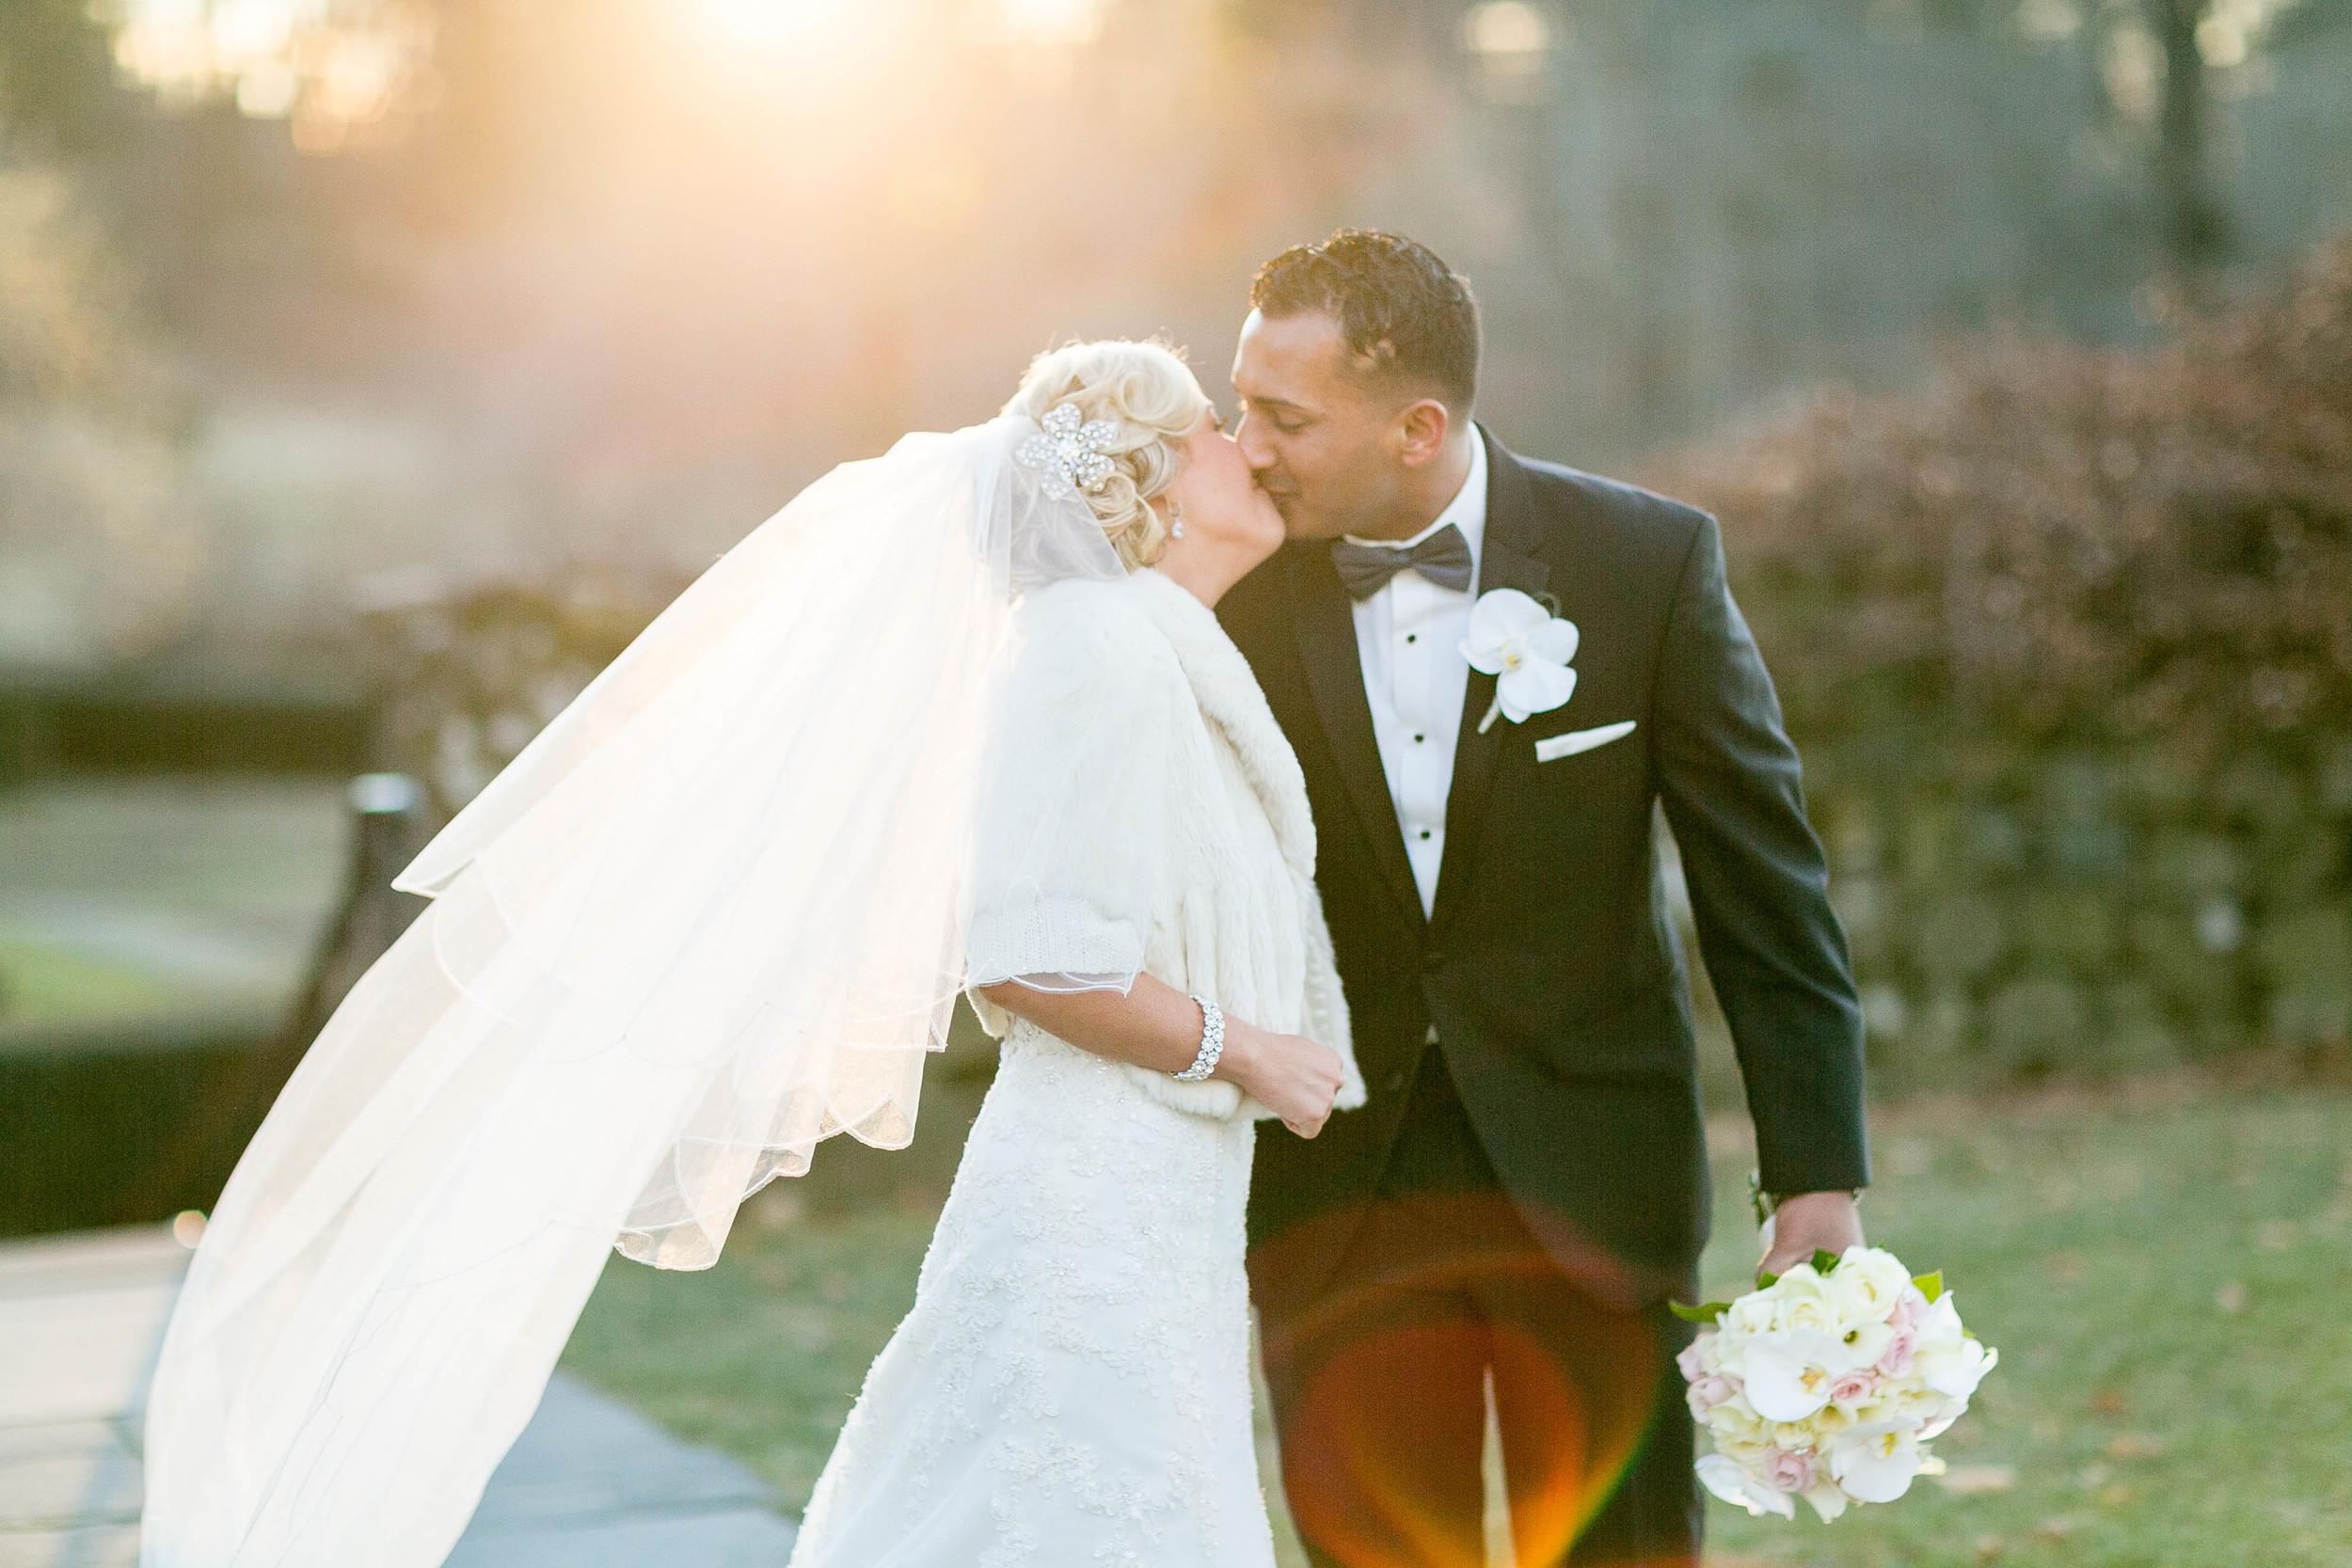 NYE-Hill-Stead-Museum-Farmington-Connecticut-Wedding-Jacek-Dolata-Photography-11.jpg